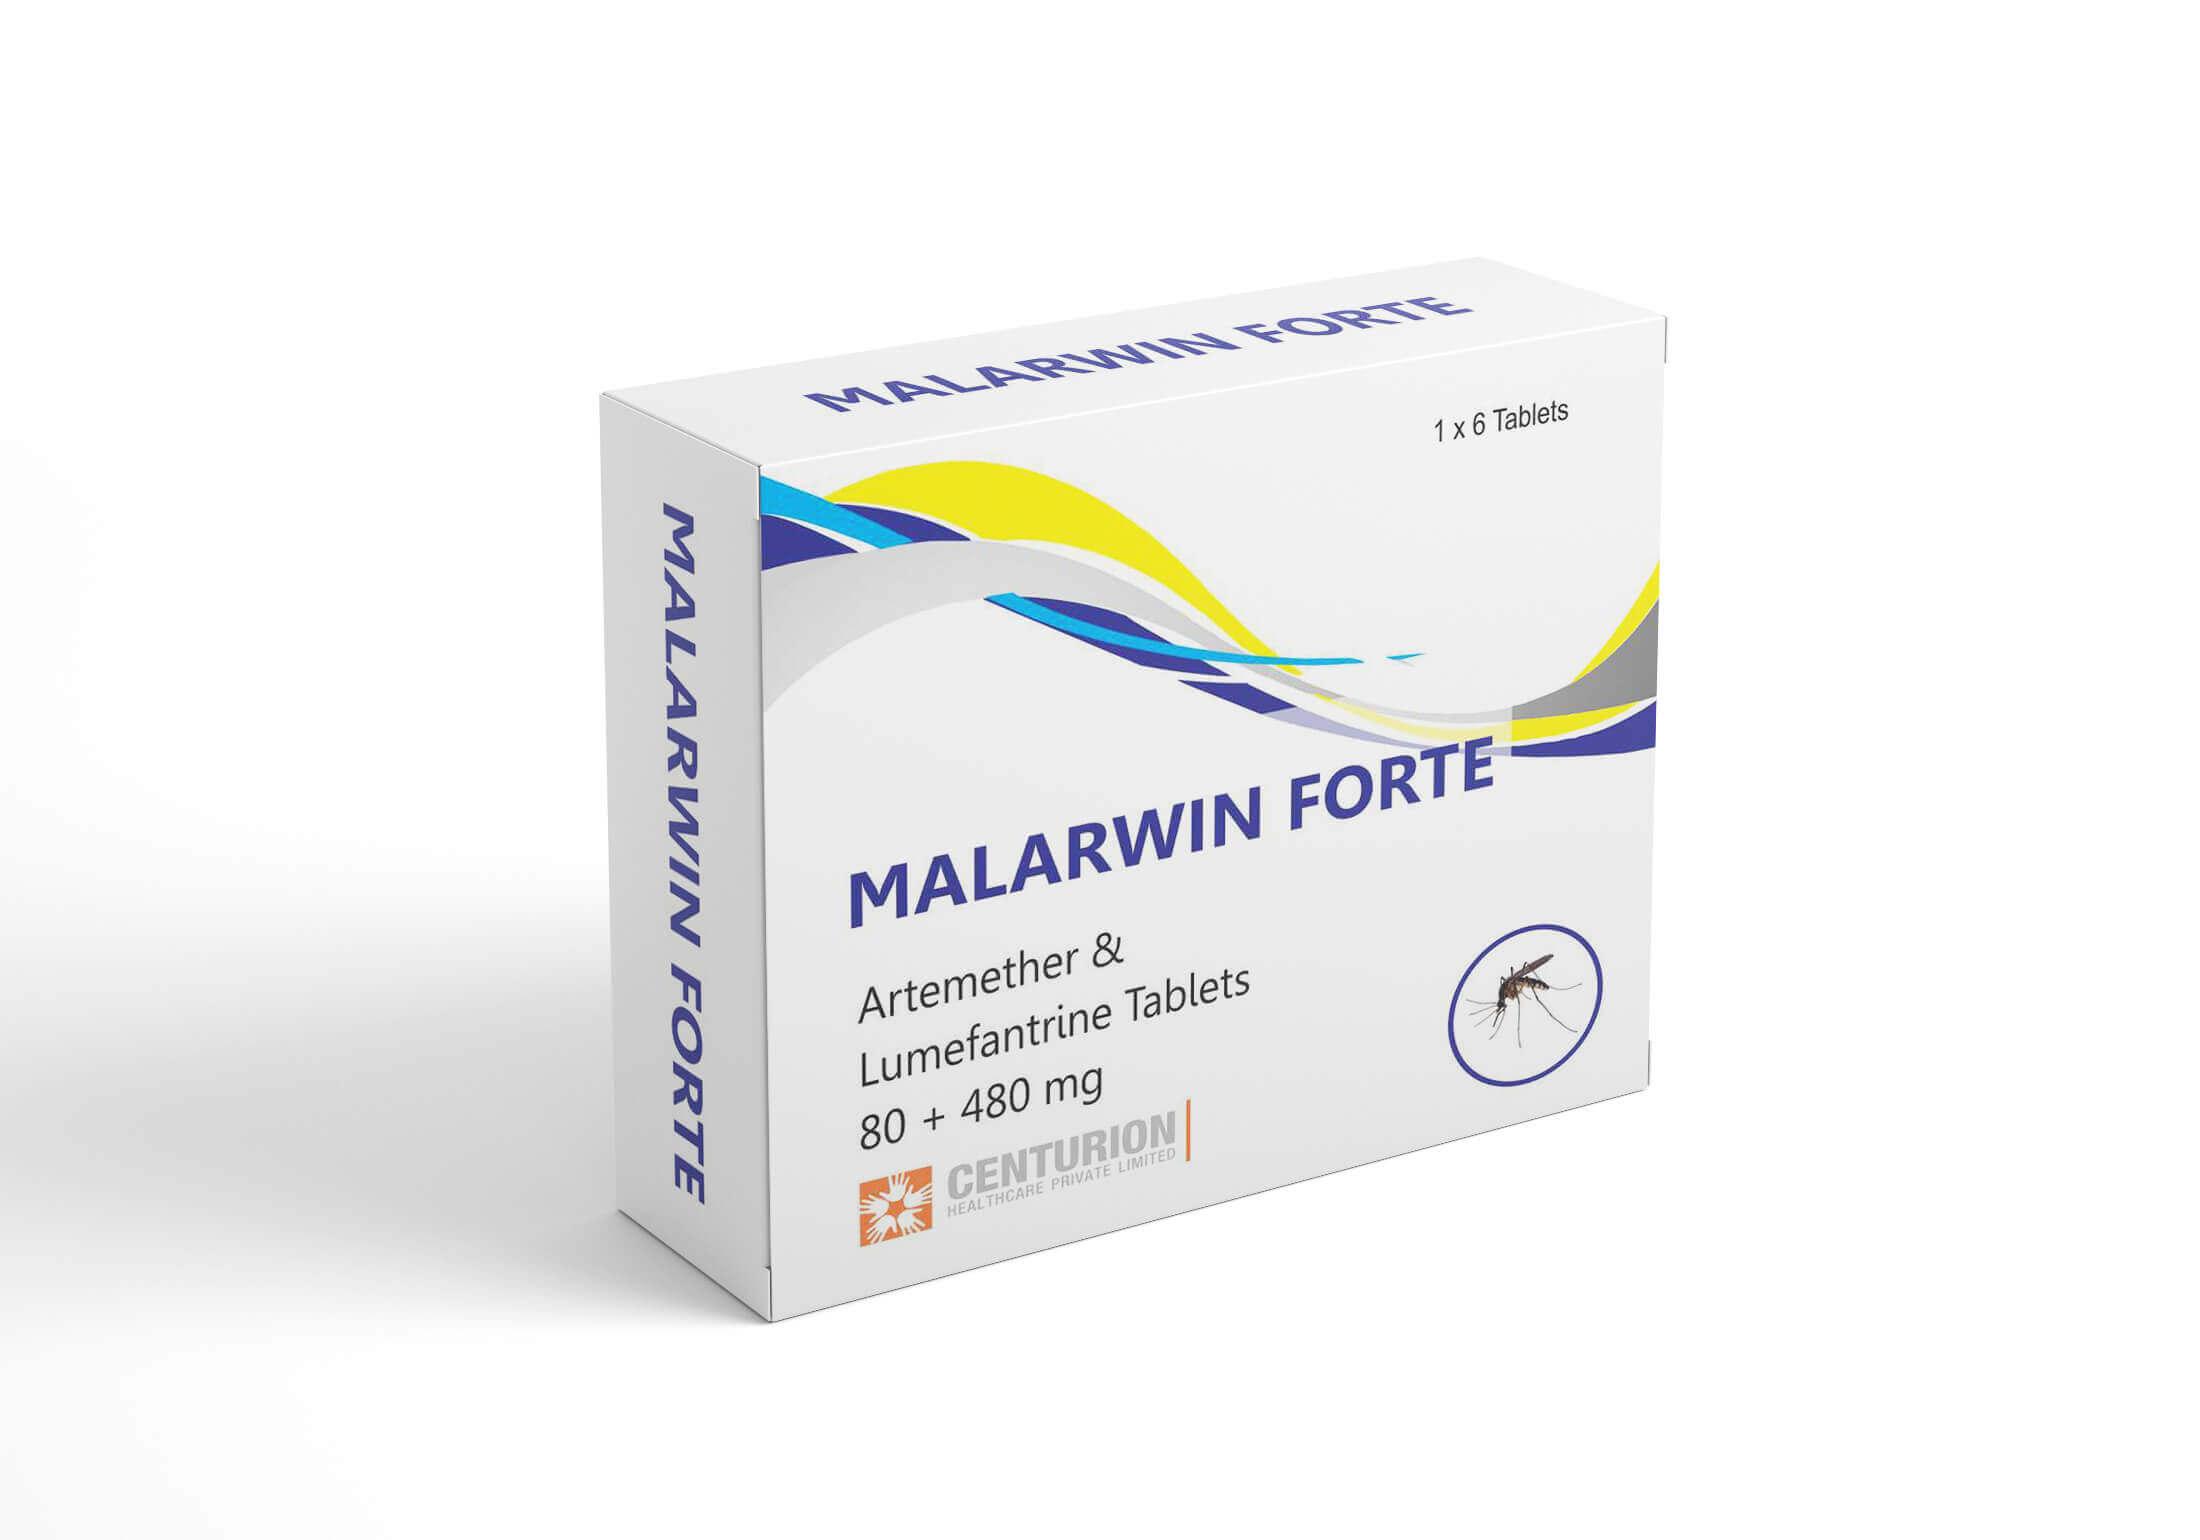 Artemether Lumefantrine Tablets 80+480 mg